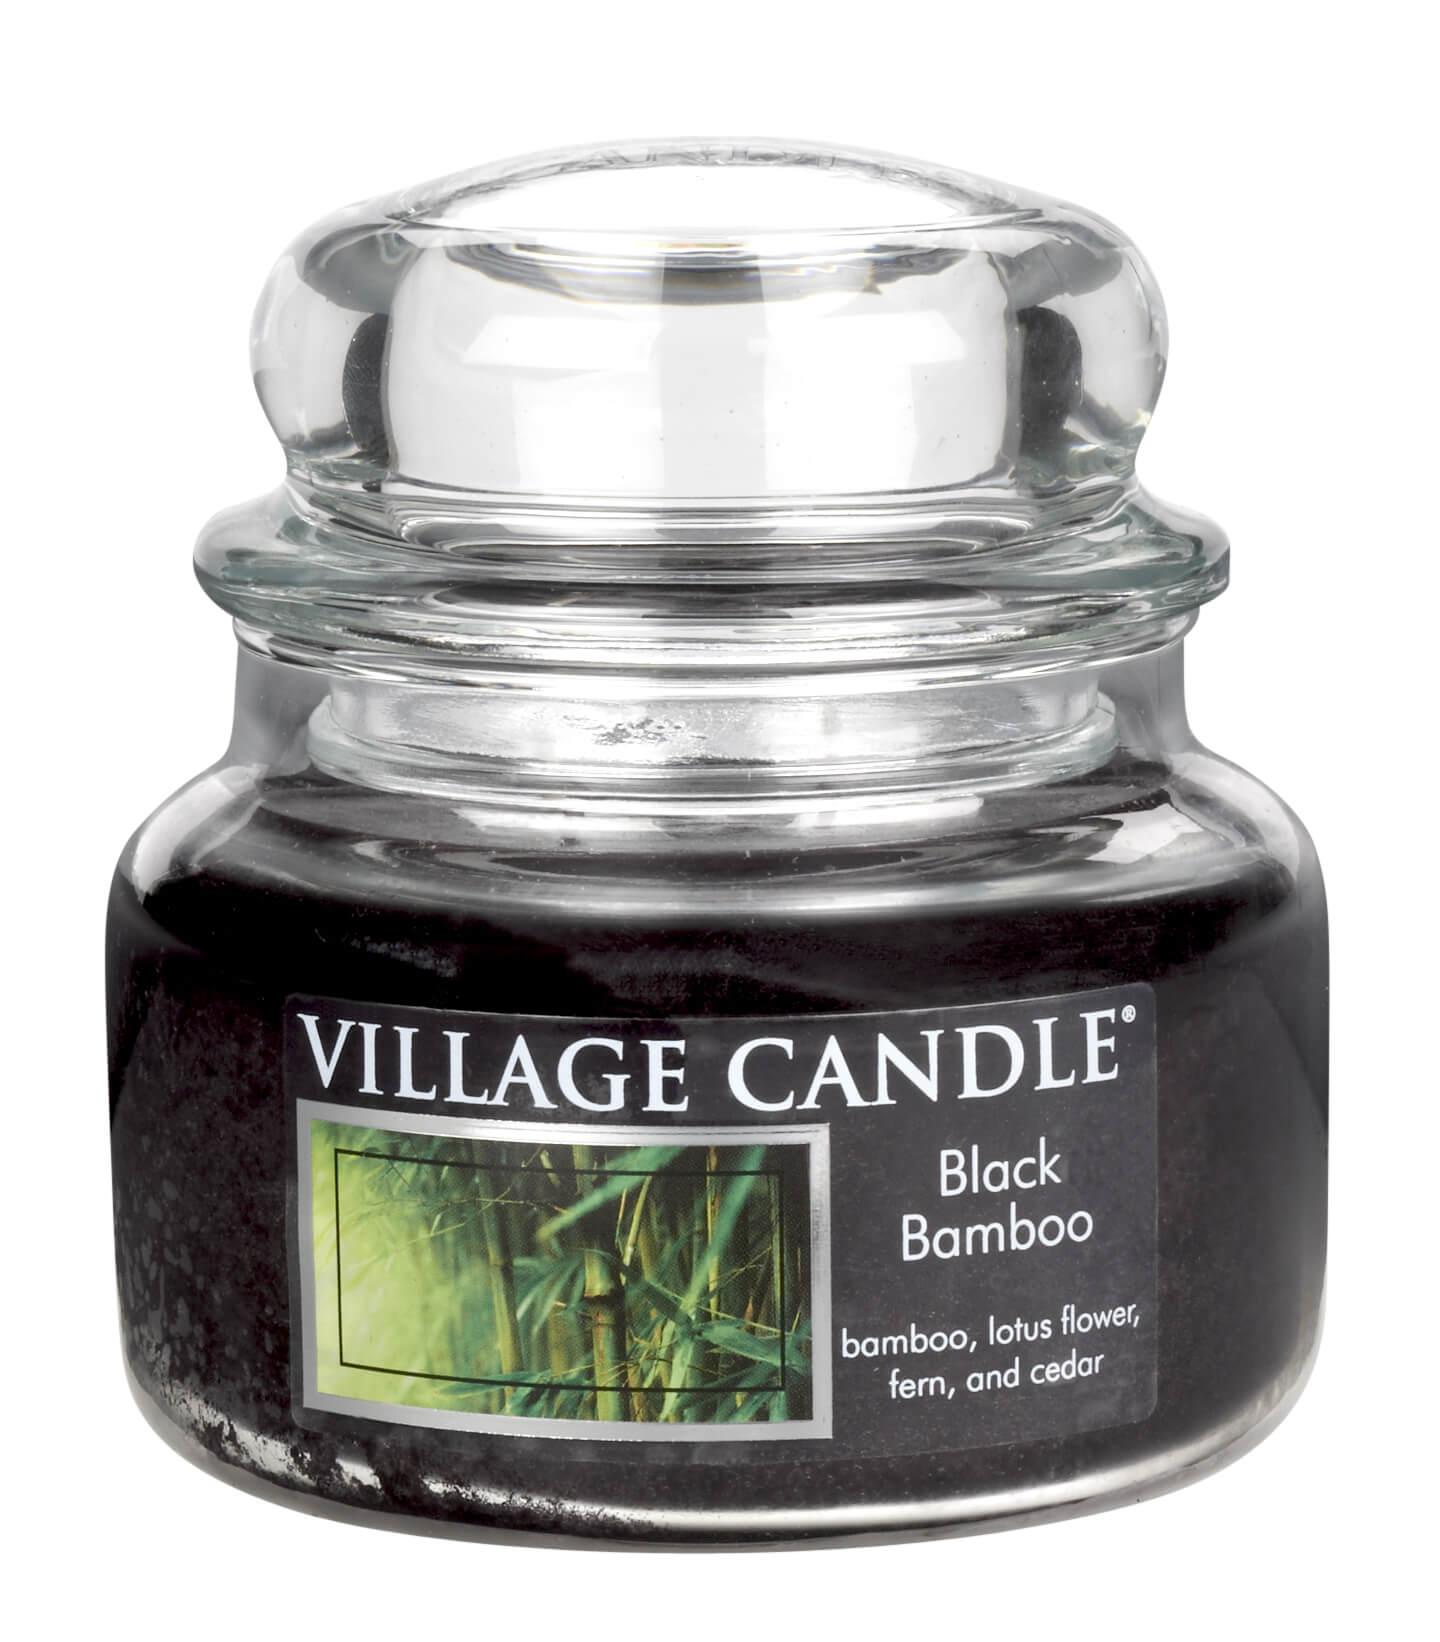 Village Candle Duftkerze Im Glas Bambus Schwarzer Bambus 269 G